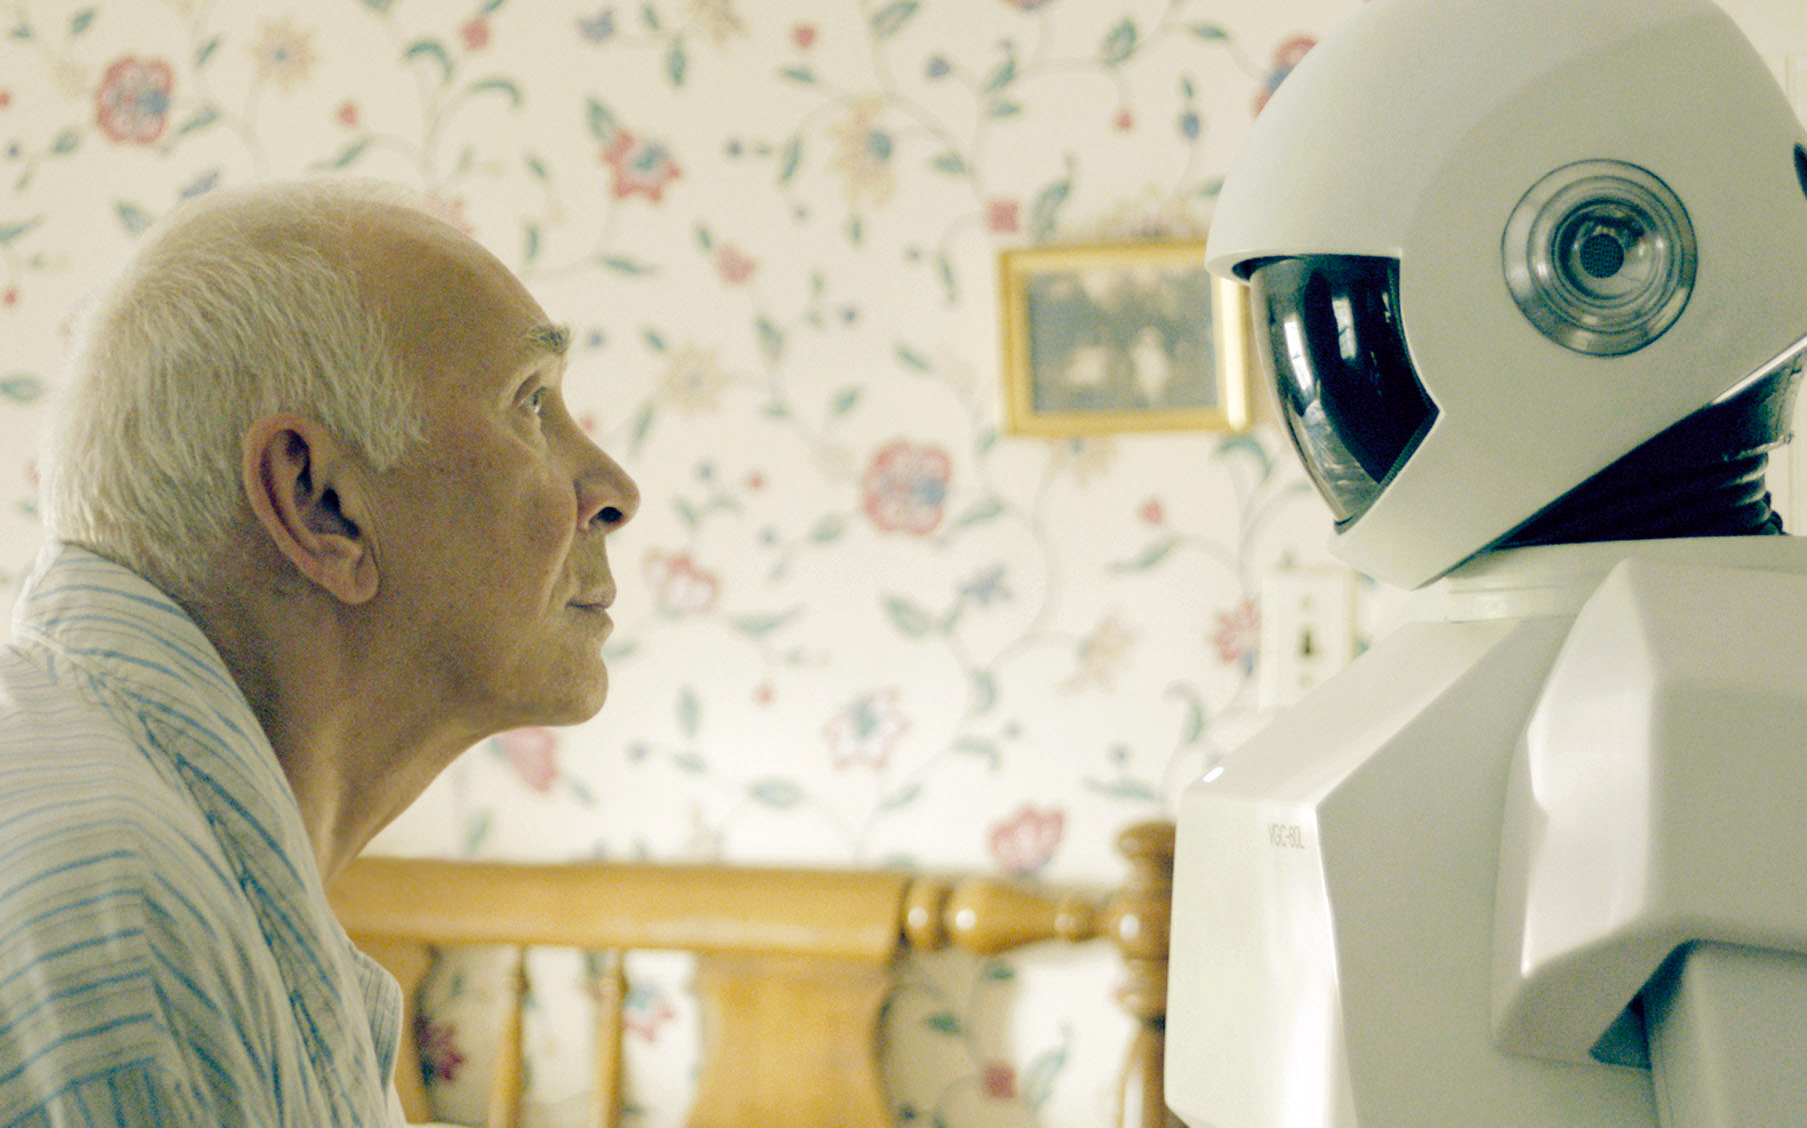 robot-frank_filmforlife